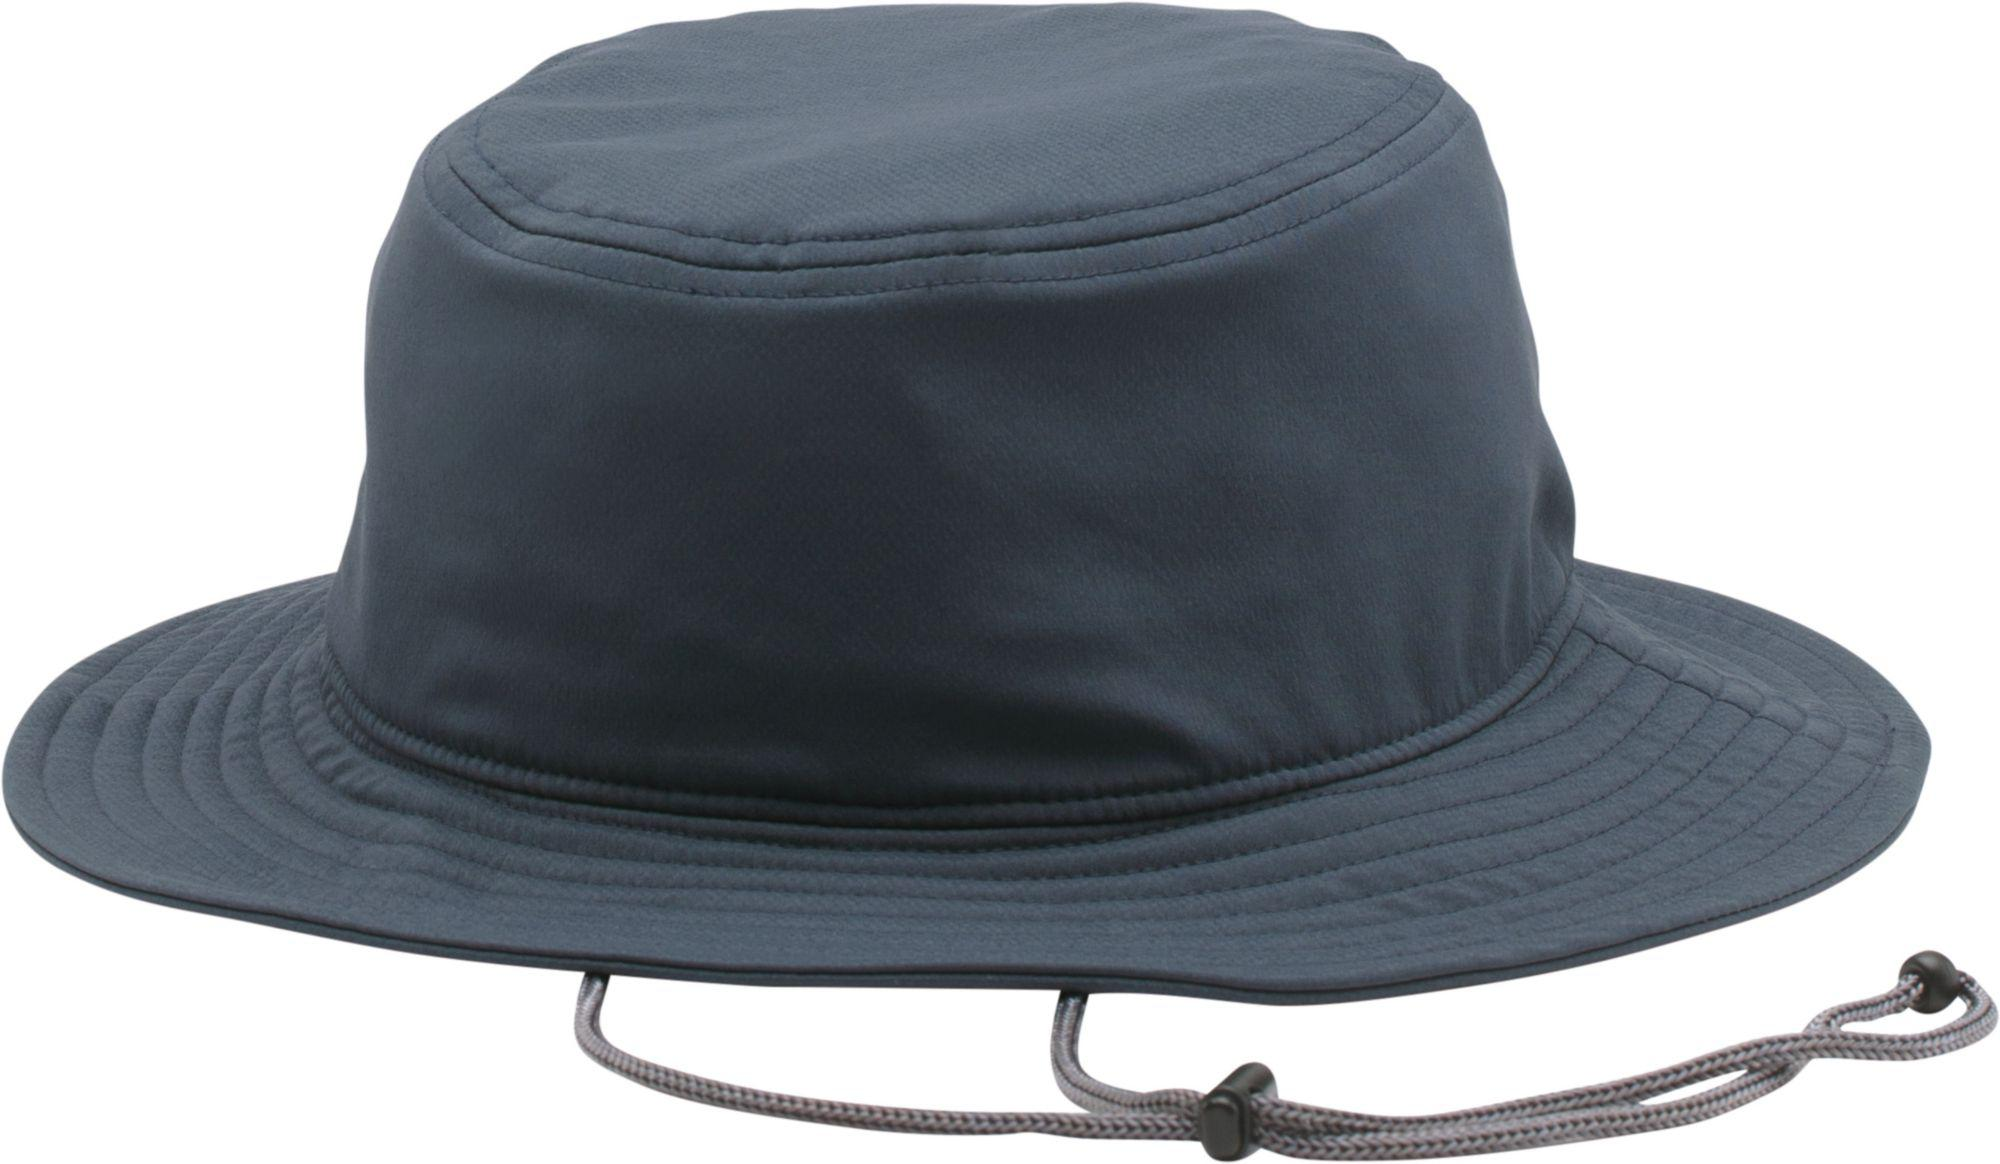 Lyst - Under Armour Fish Hook Bucket Hat in Gray for Men b436b7b1316